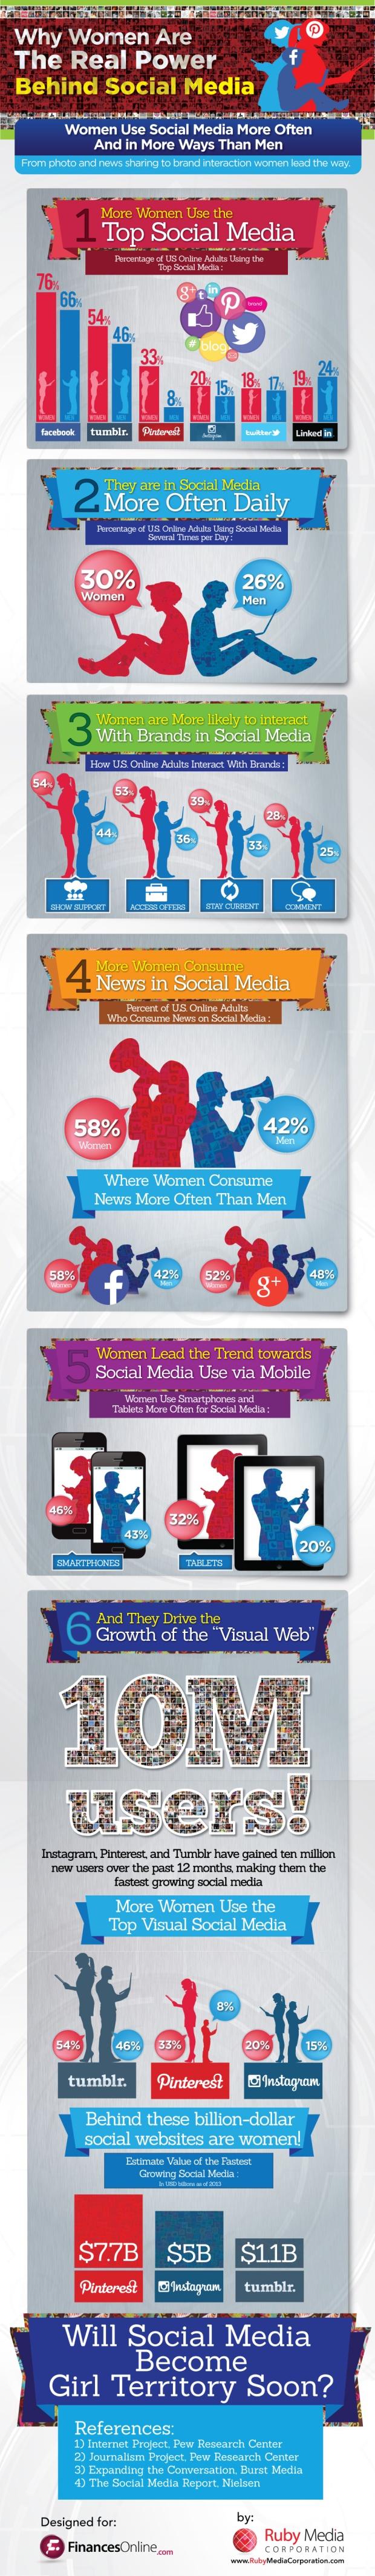 Men or Women: Who Dominates the Social Media Environment?